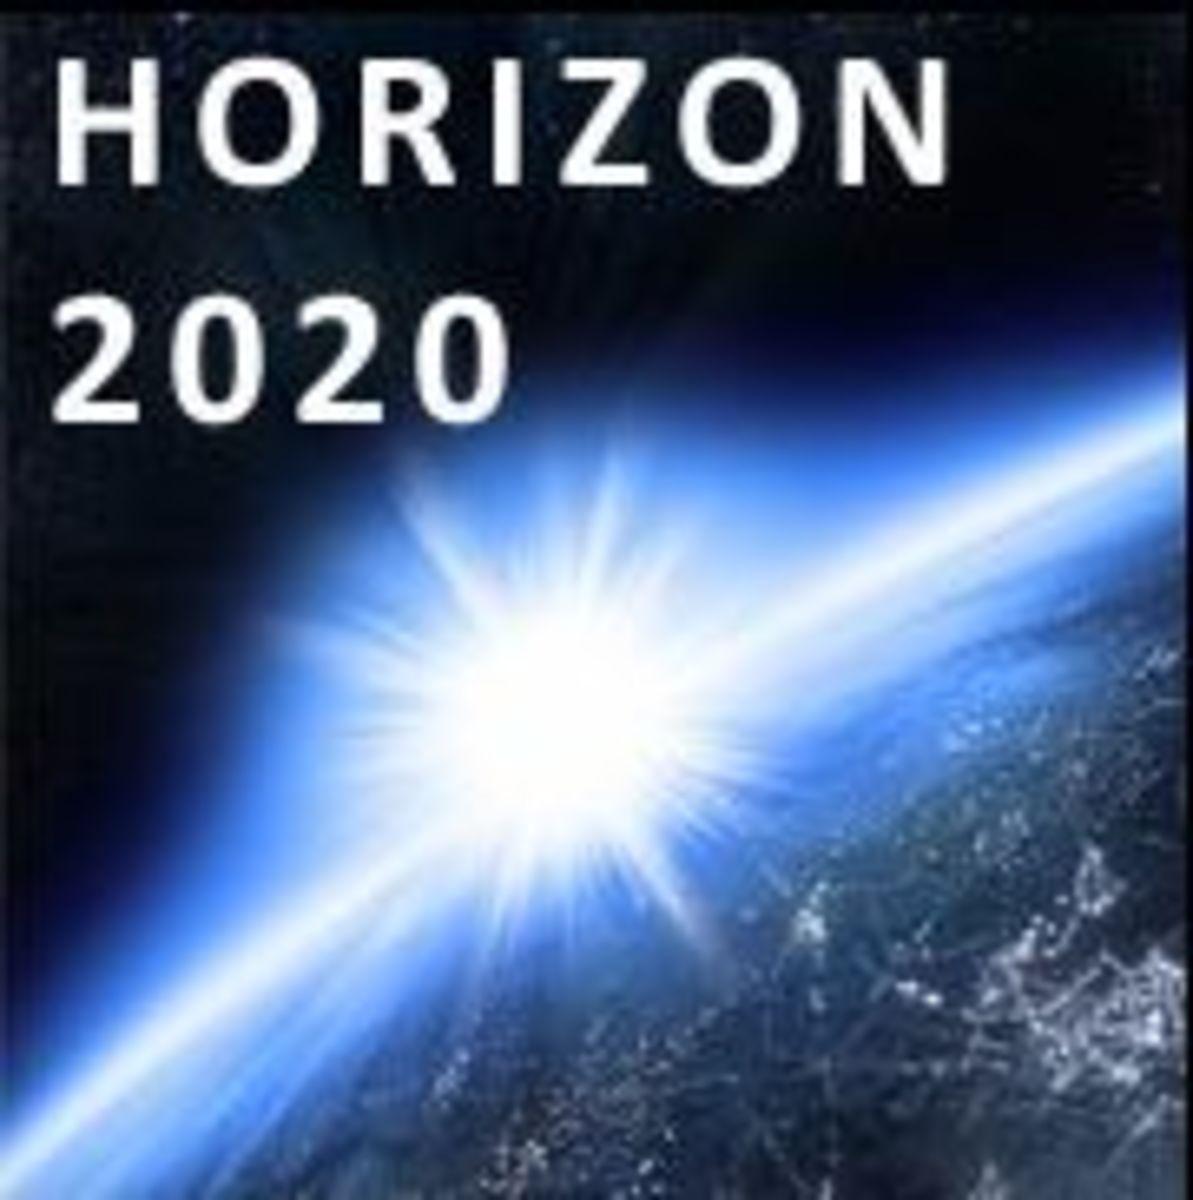 EU Horizon 2020 Marie Curie Program Individual fellowships (IF) tips